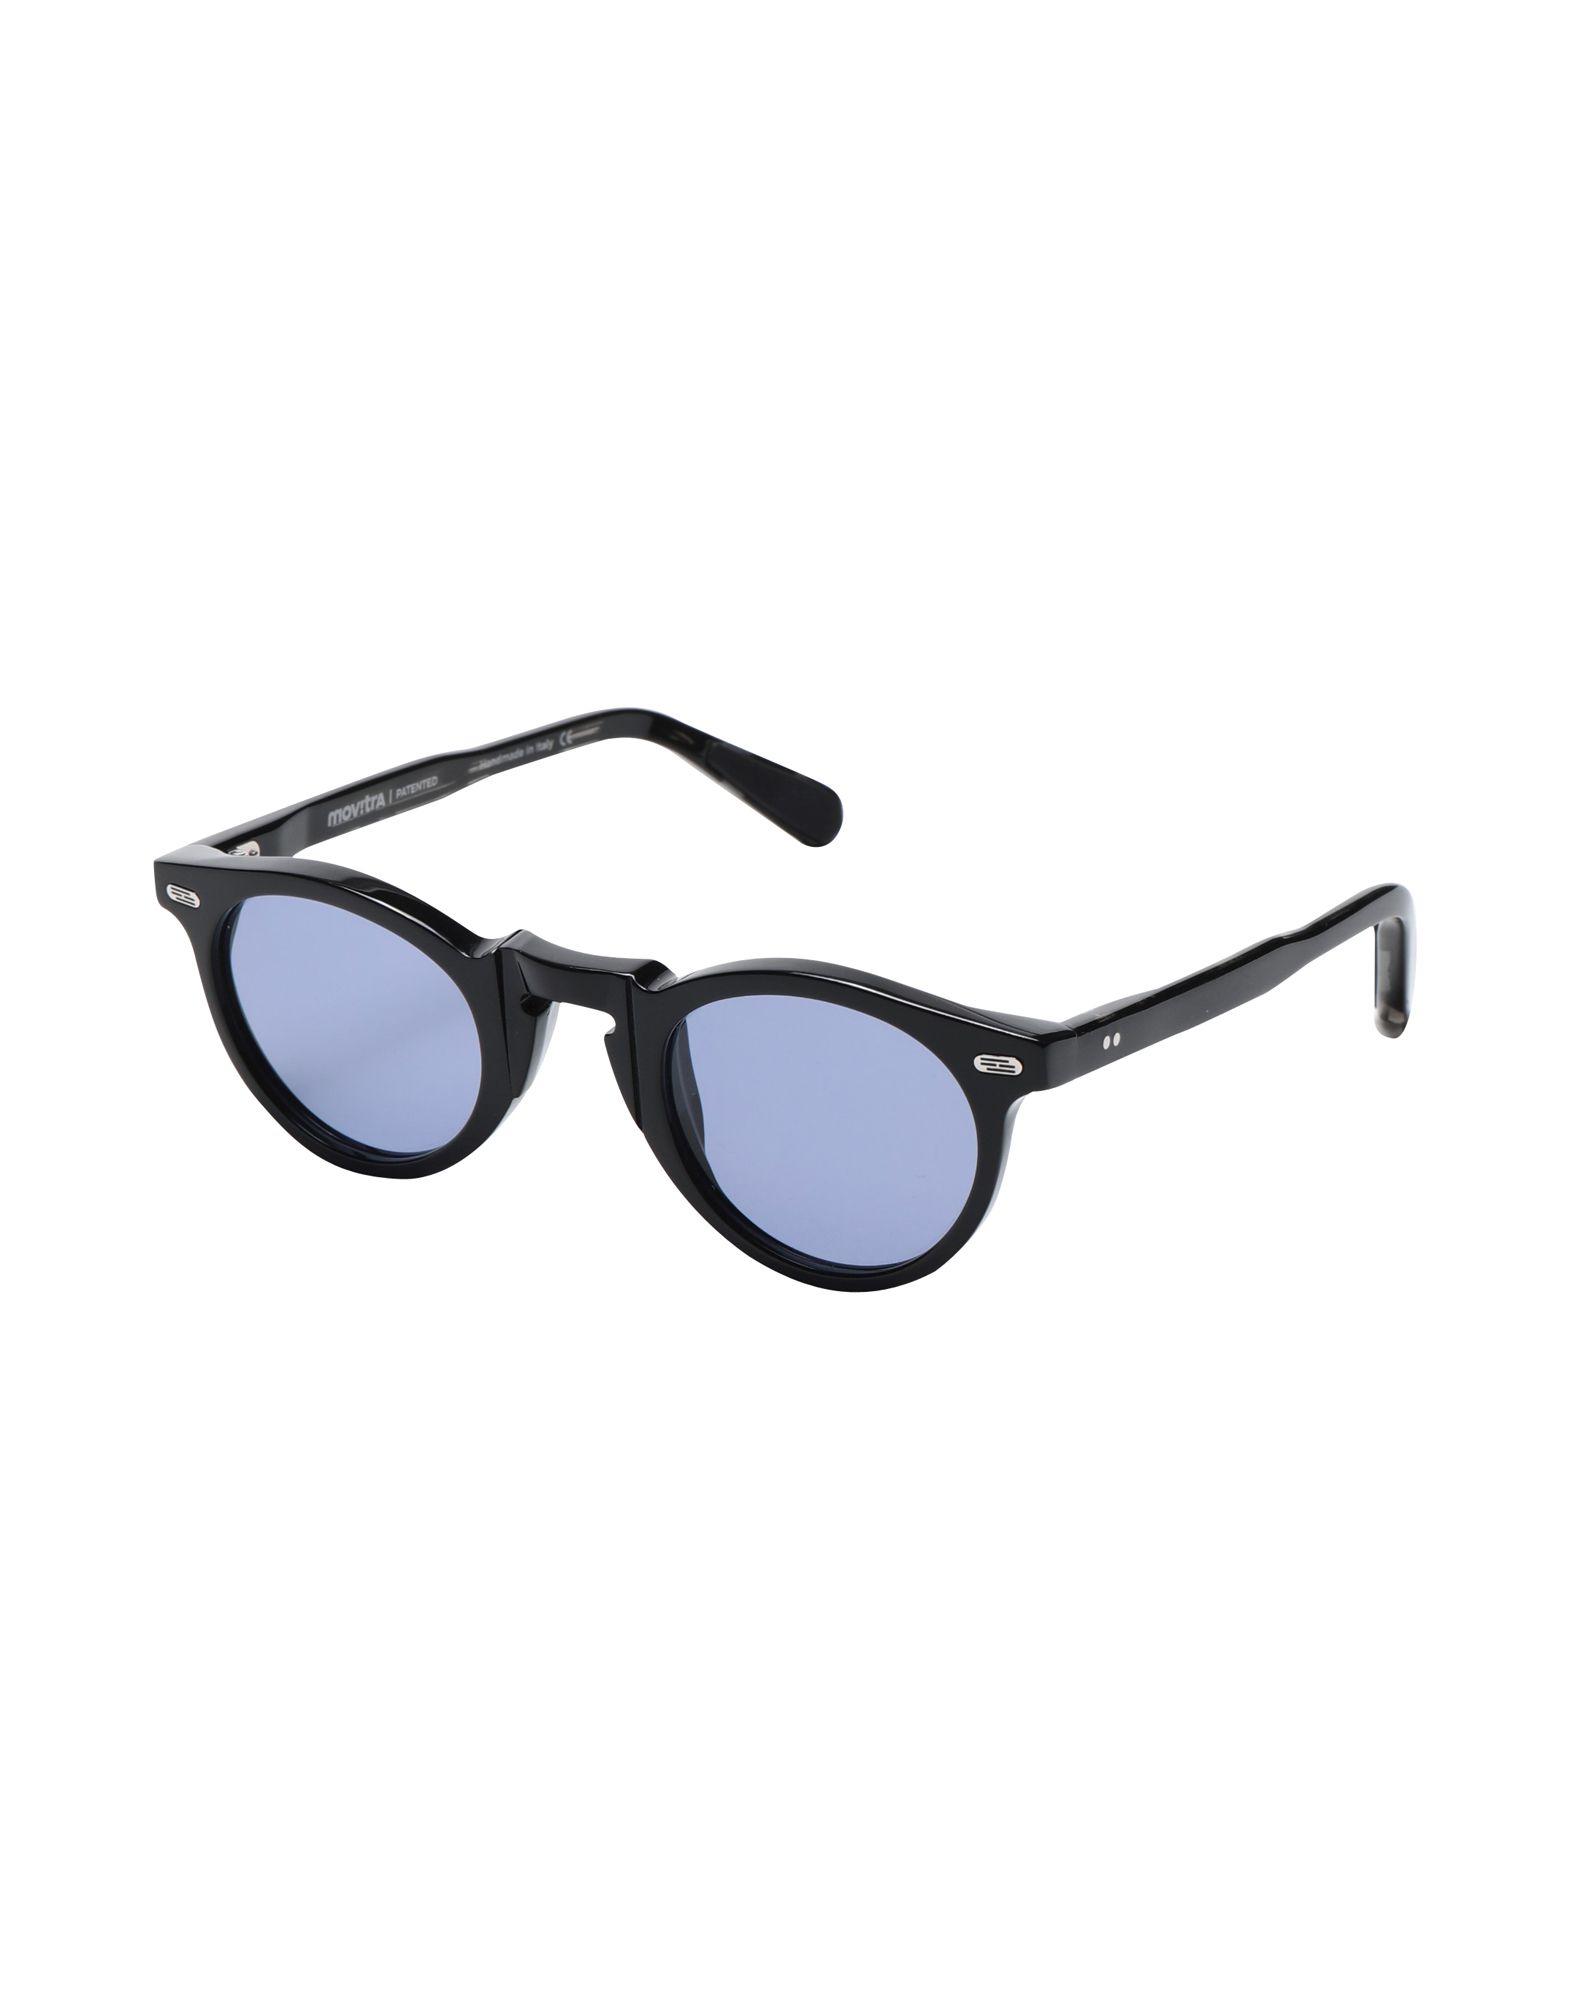 Фото - MOVITRA Солнечные очки 3d очки